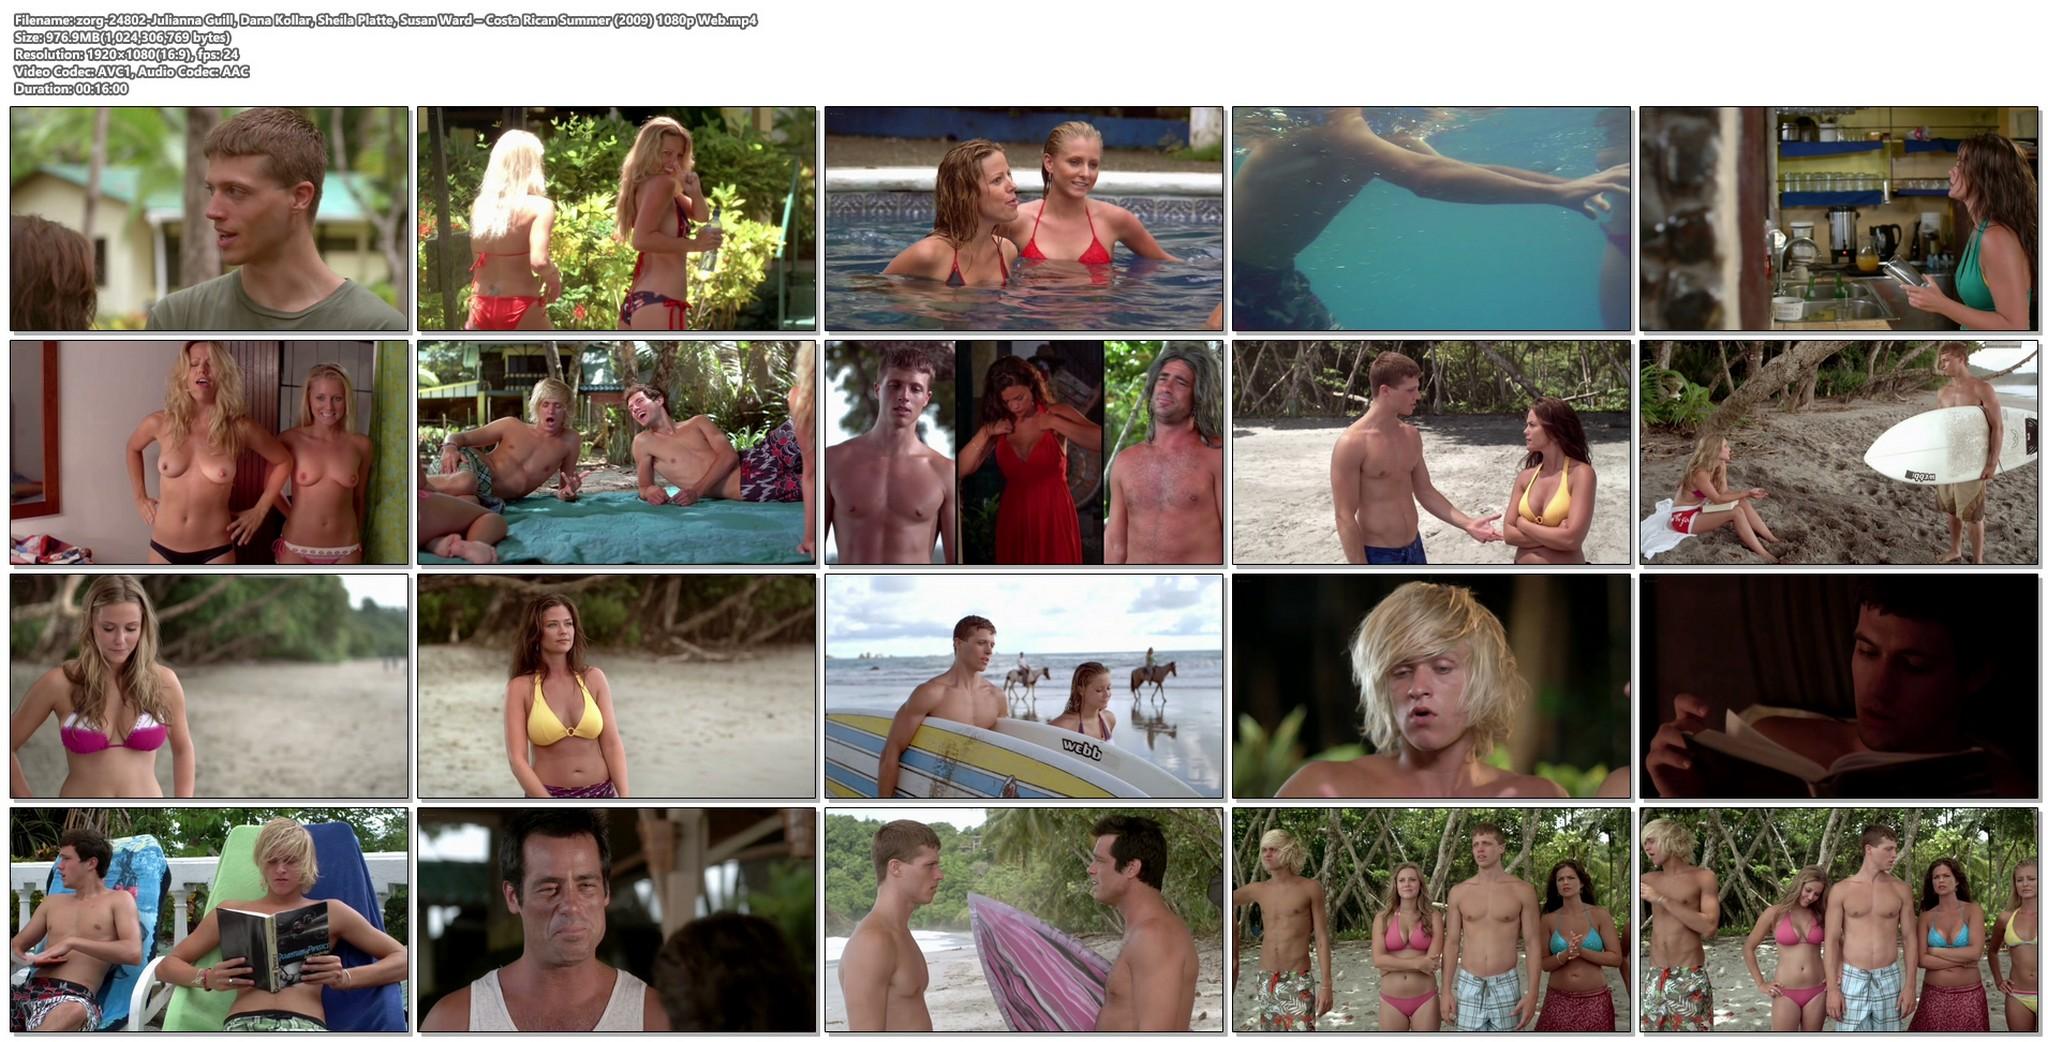 Dana Kollar and Sheila Platte nude topless Julianna Guill and Susan Ward hot Costa Rican Summer 2009 1080p Web 20